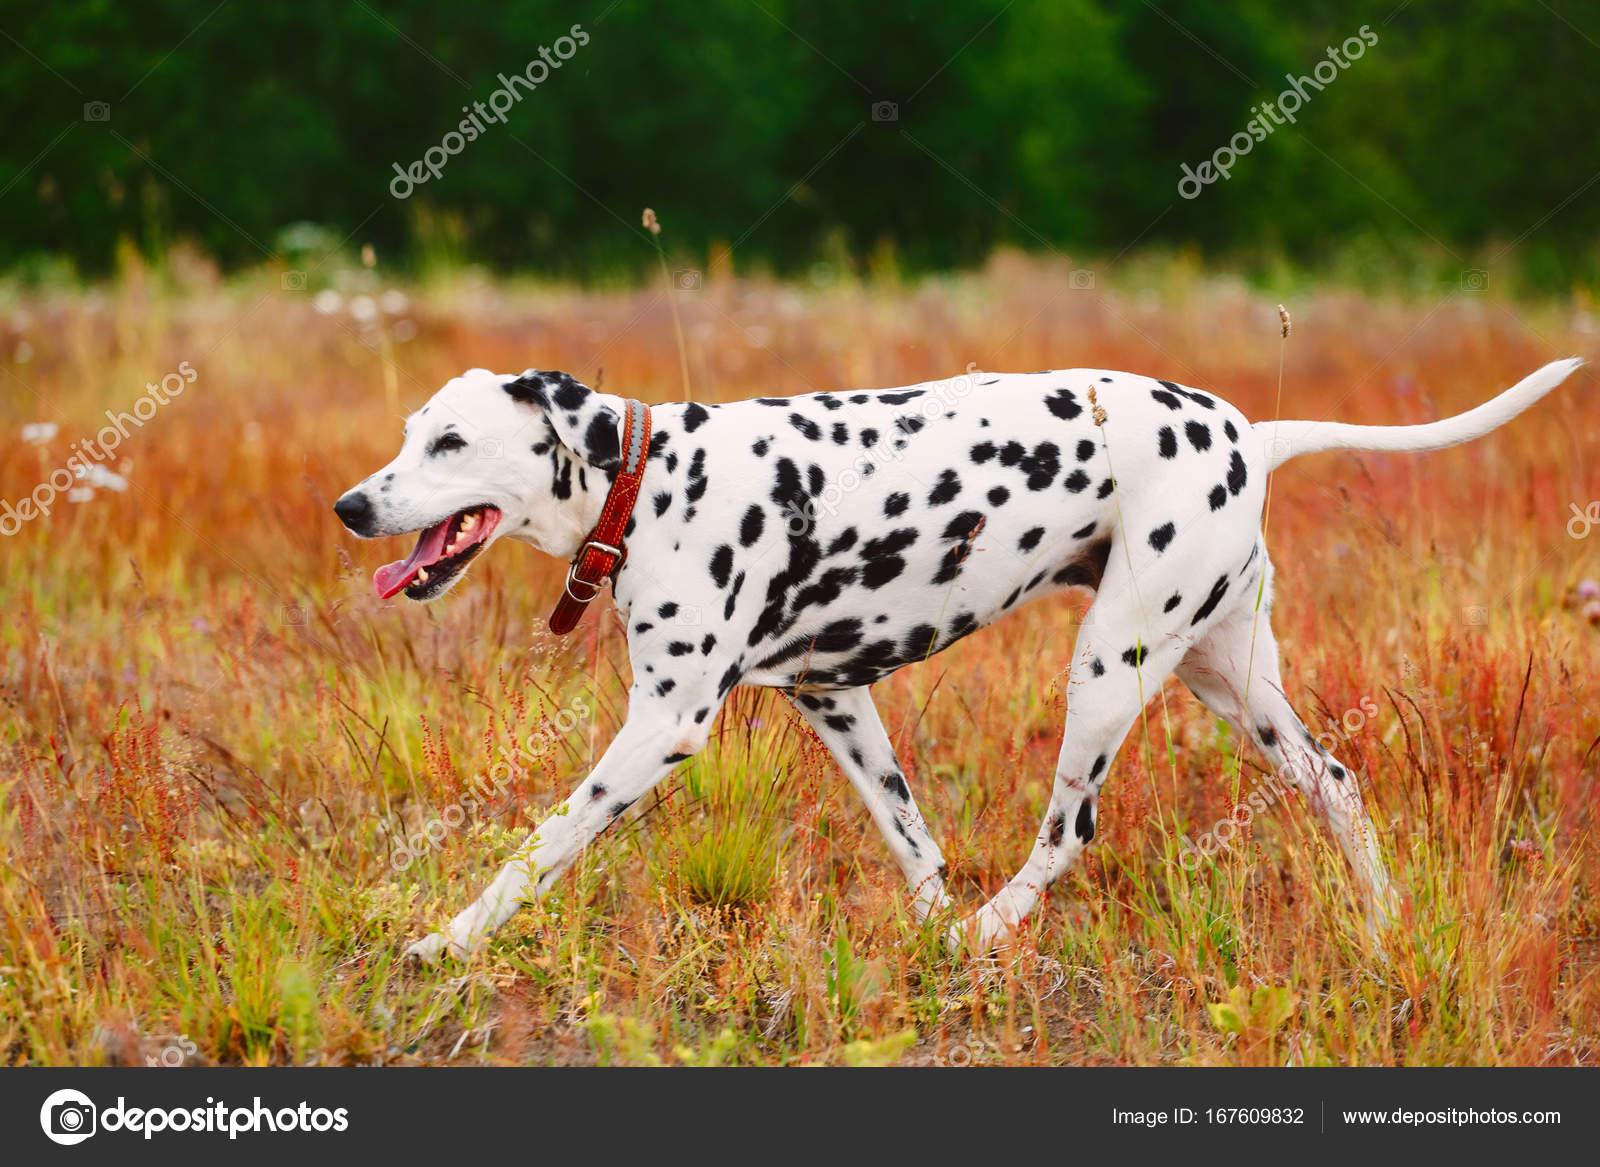 Cute Dog Running On Field Stock Photo C Art2435 167609832